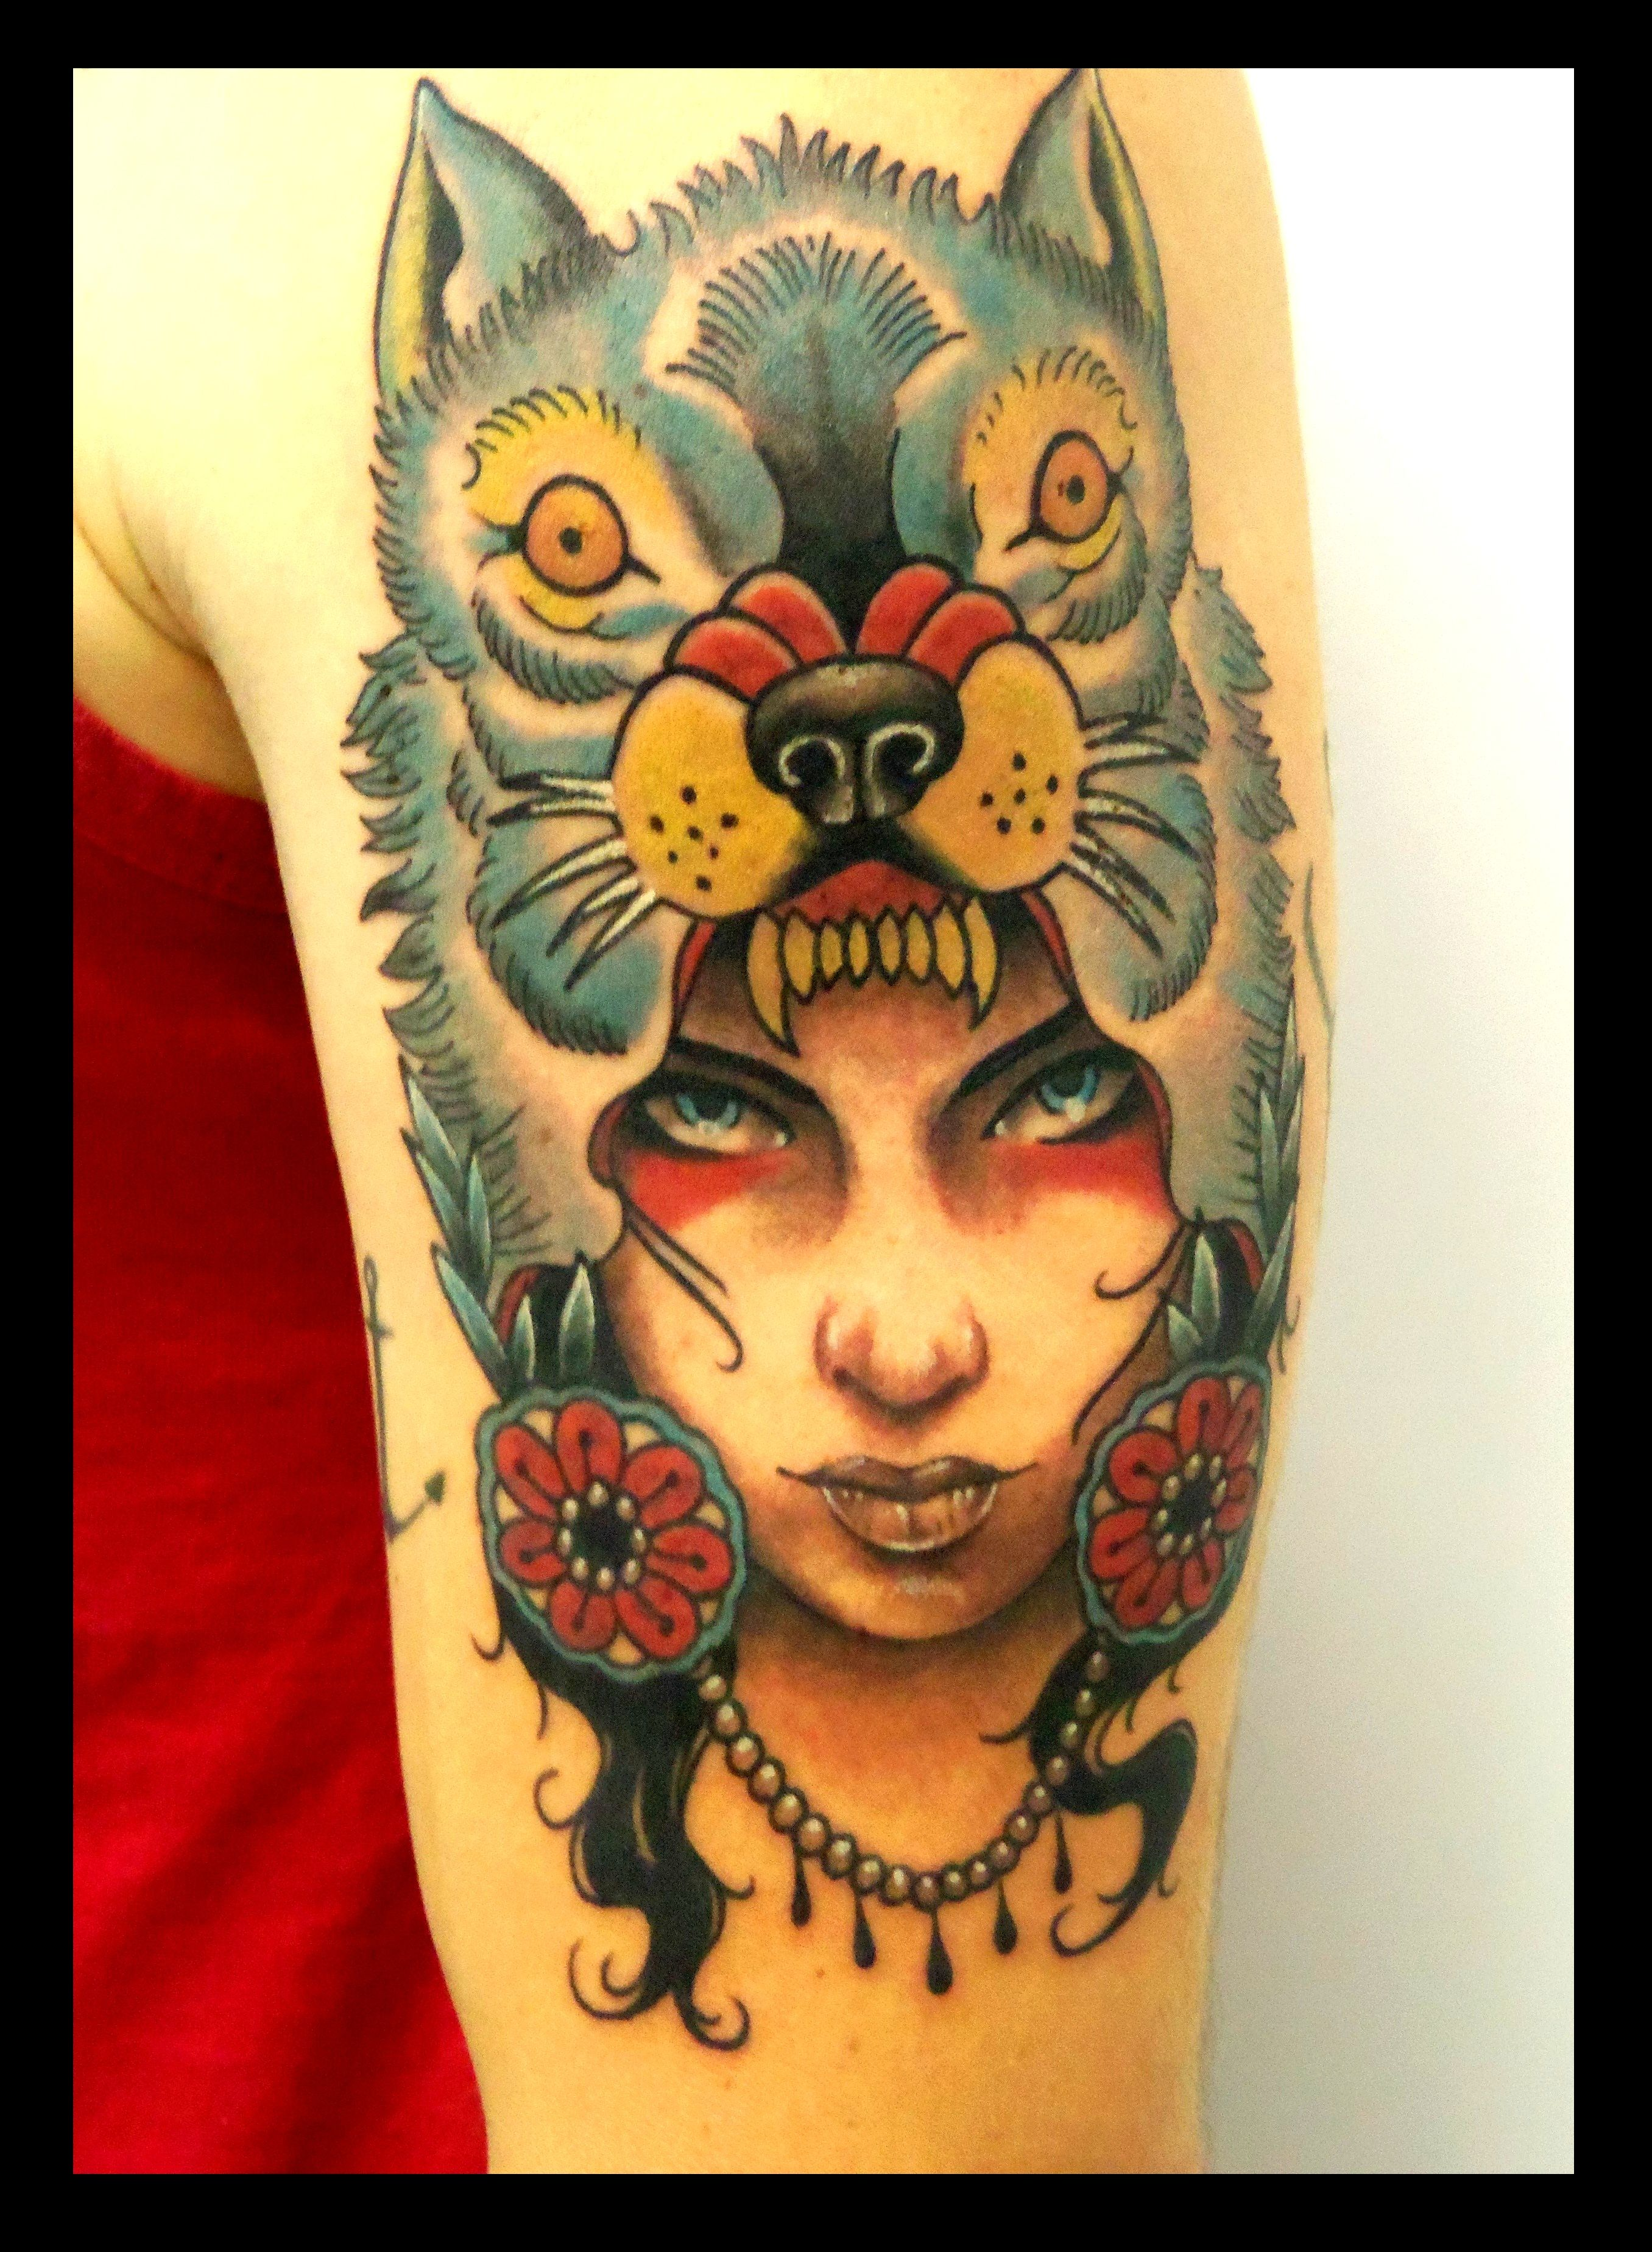 Women's tattoo designs on back pin by taffa tattoo on taffa tattoo  pinterest  tattoo